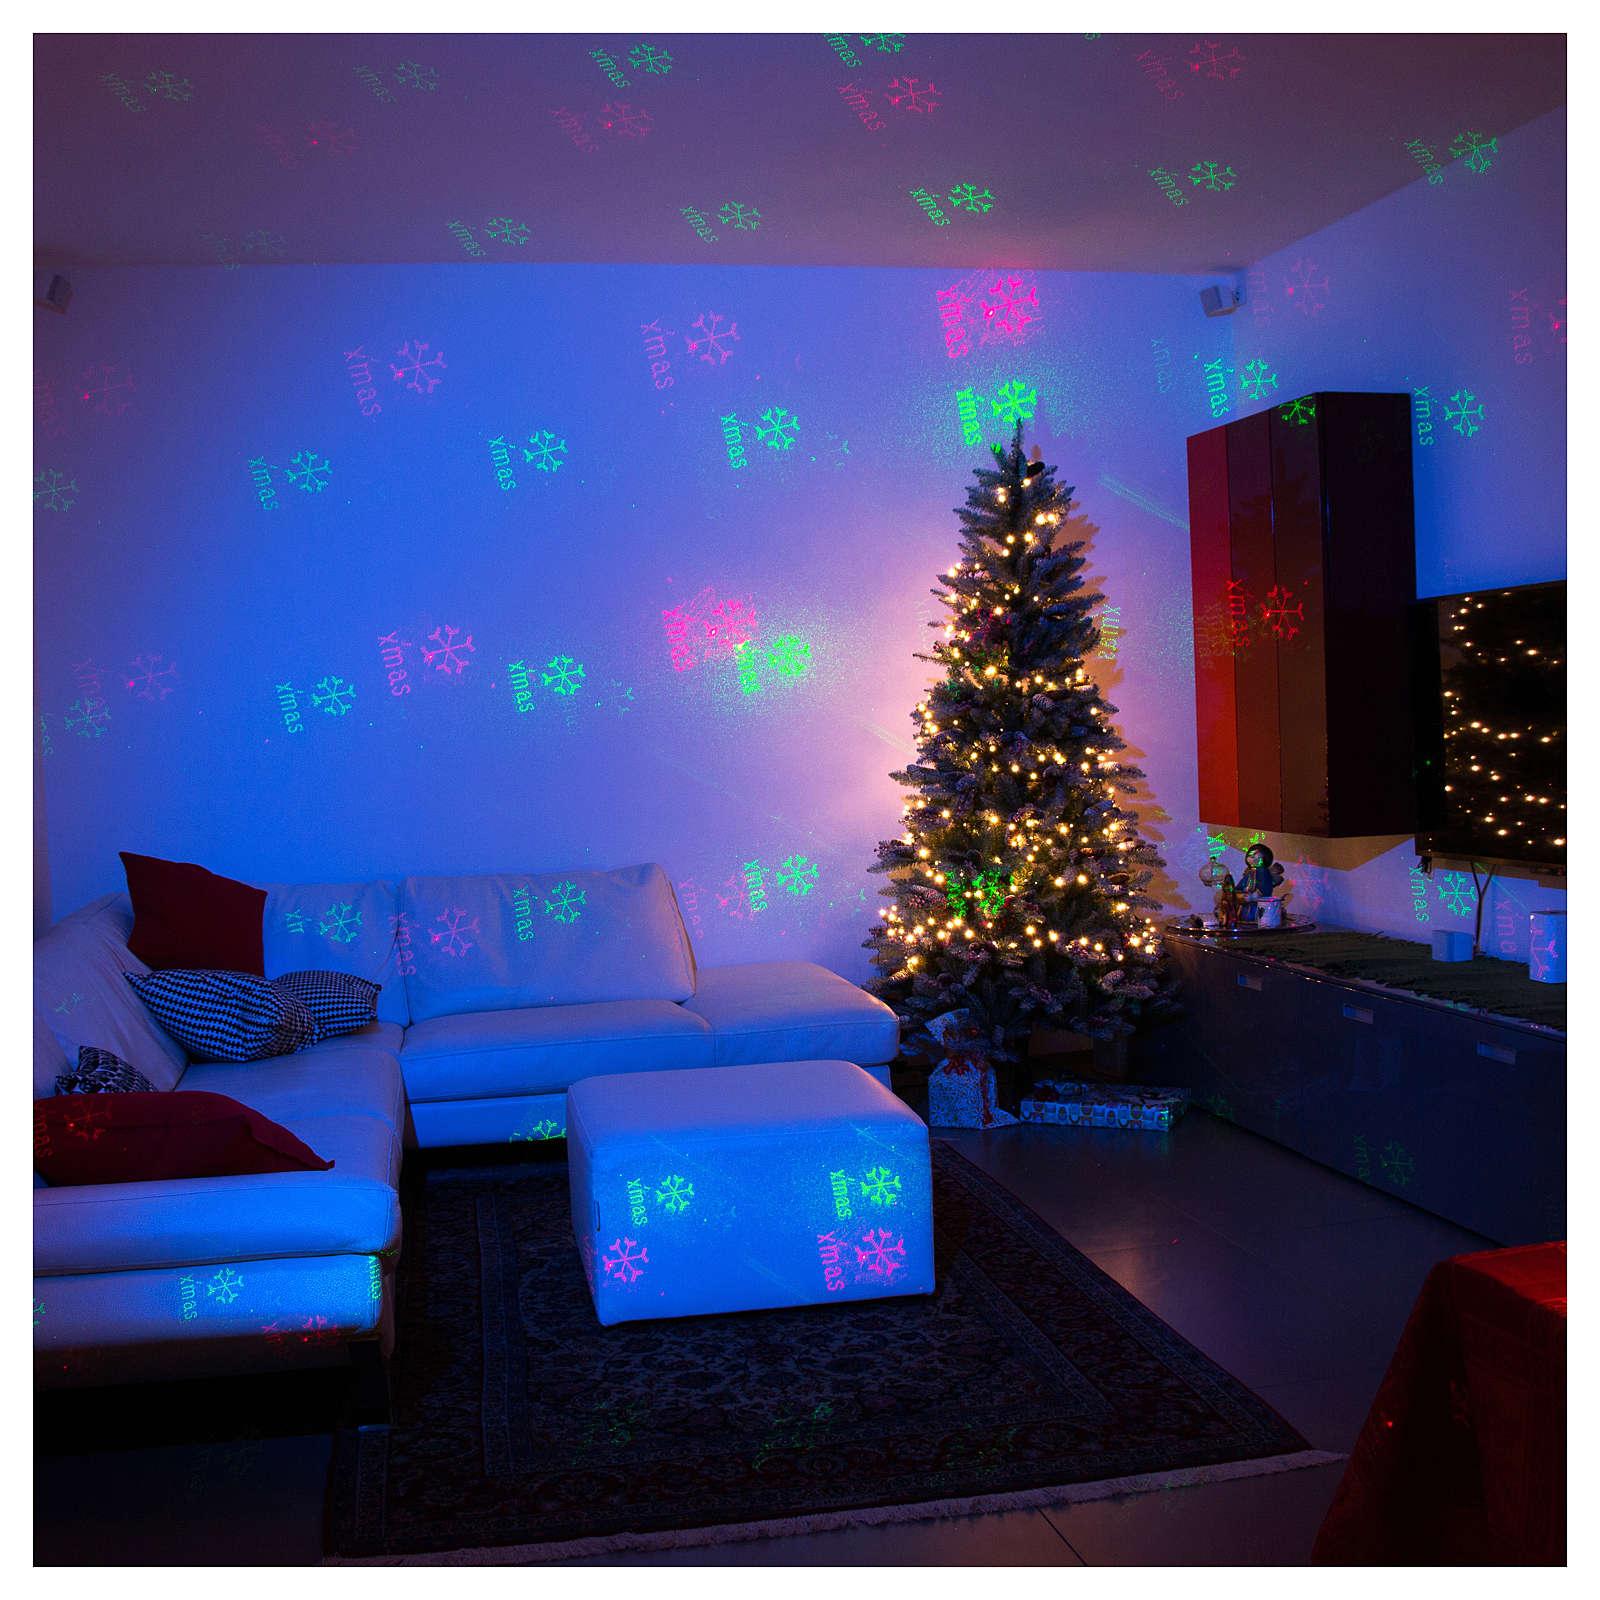 870cf710d90 Proyector Laser Luces de Navidad color azul de temática navideña para uso  interior 3